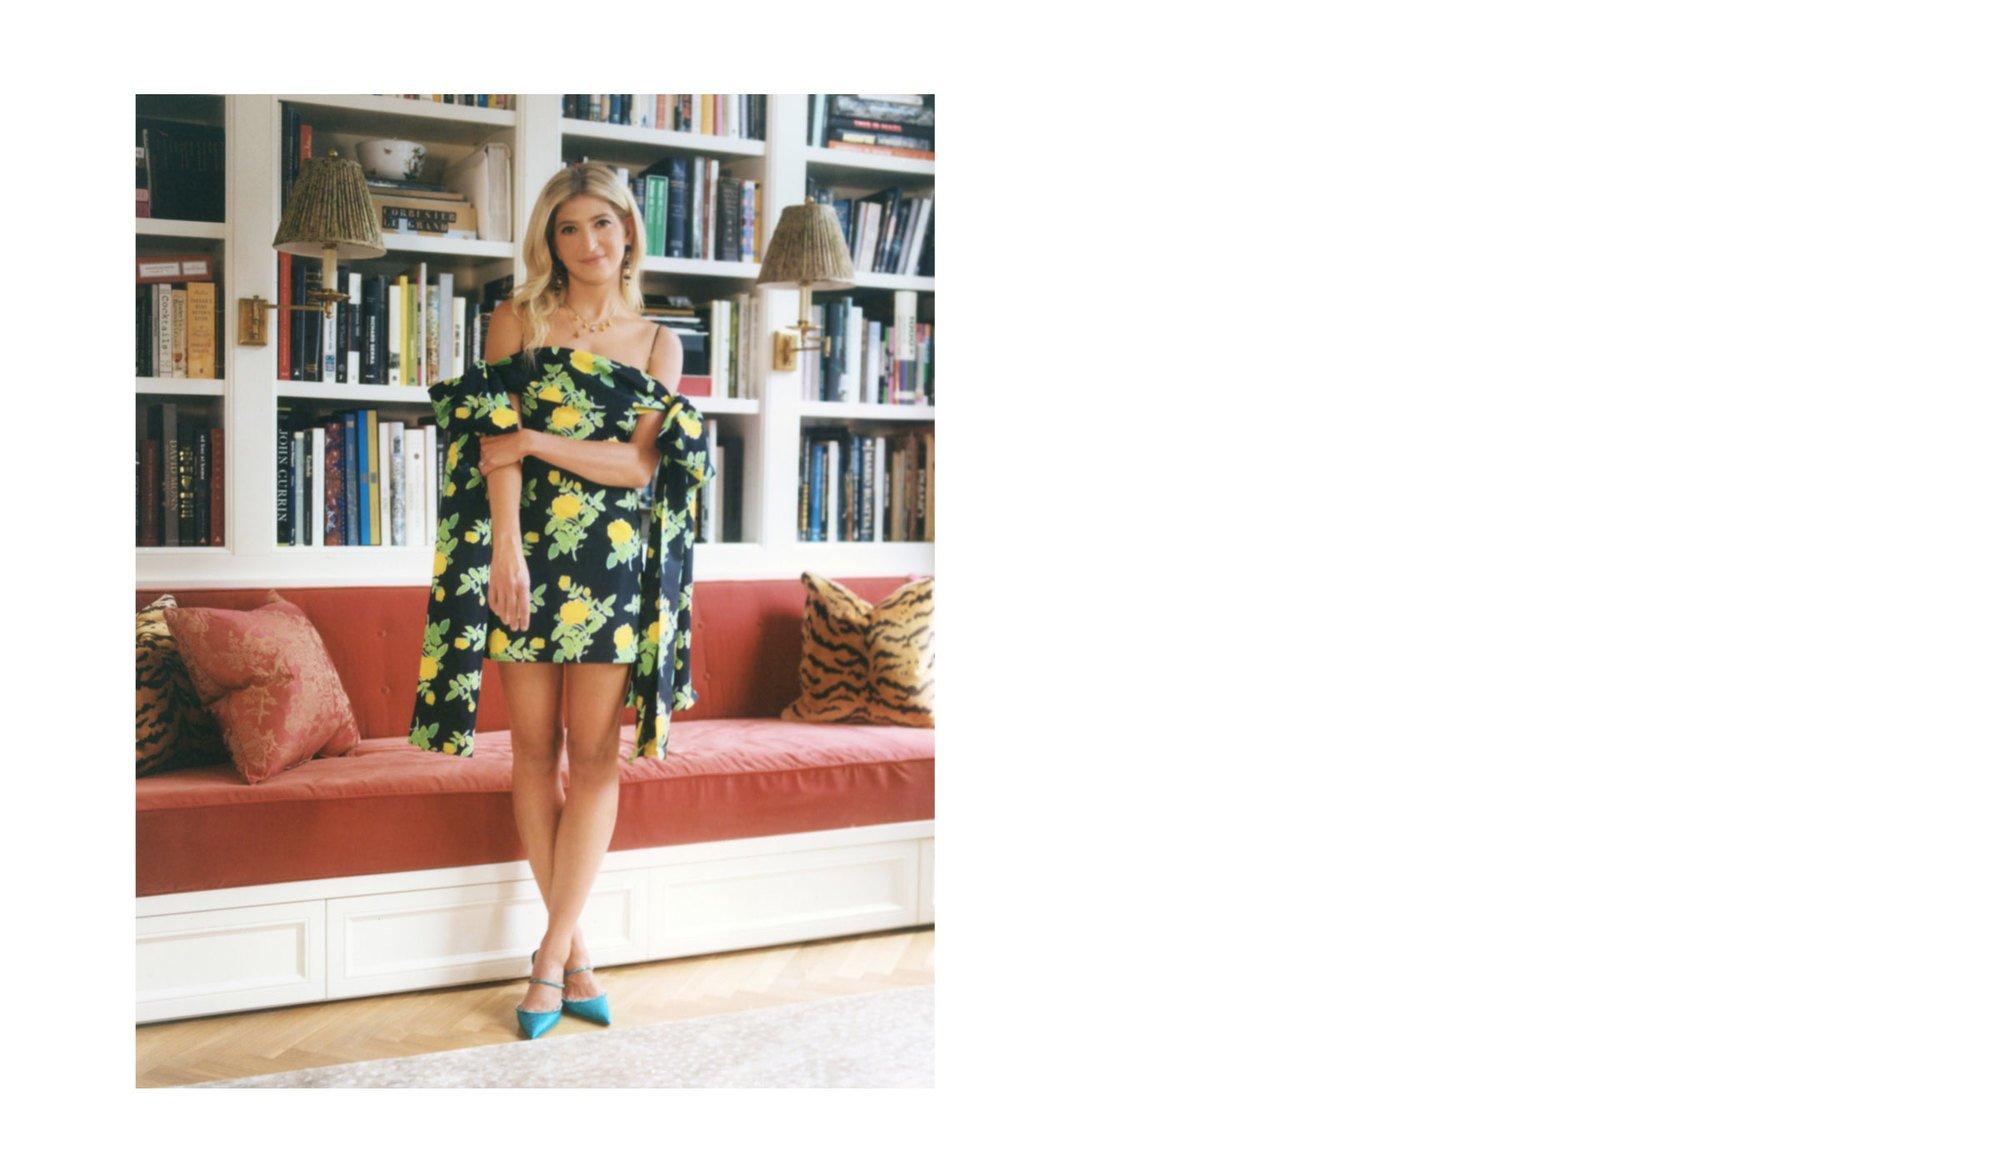 Sarah Hoover standing in her home in a Bernadette Antwerp dress